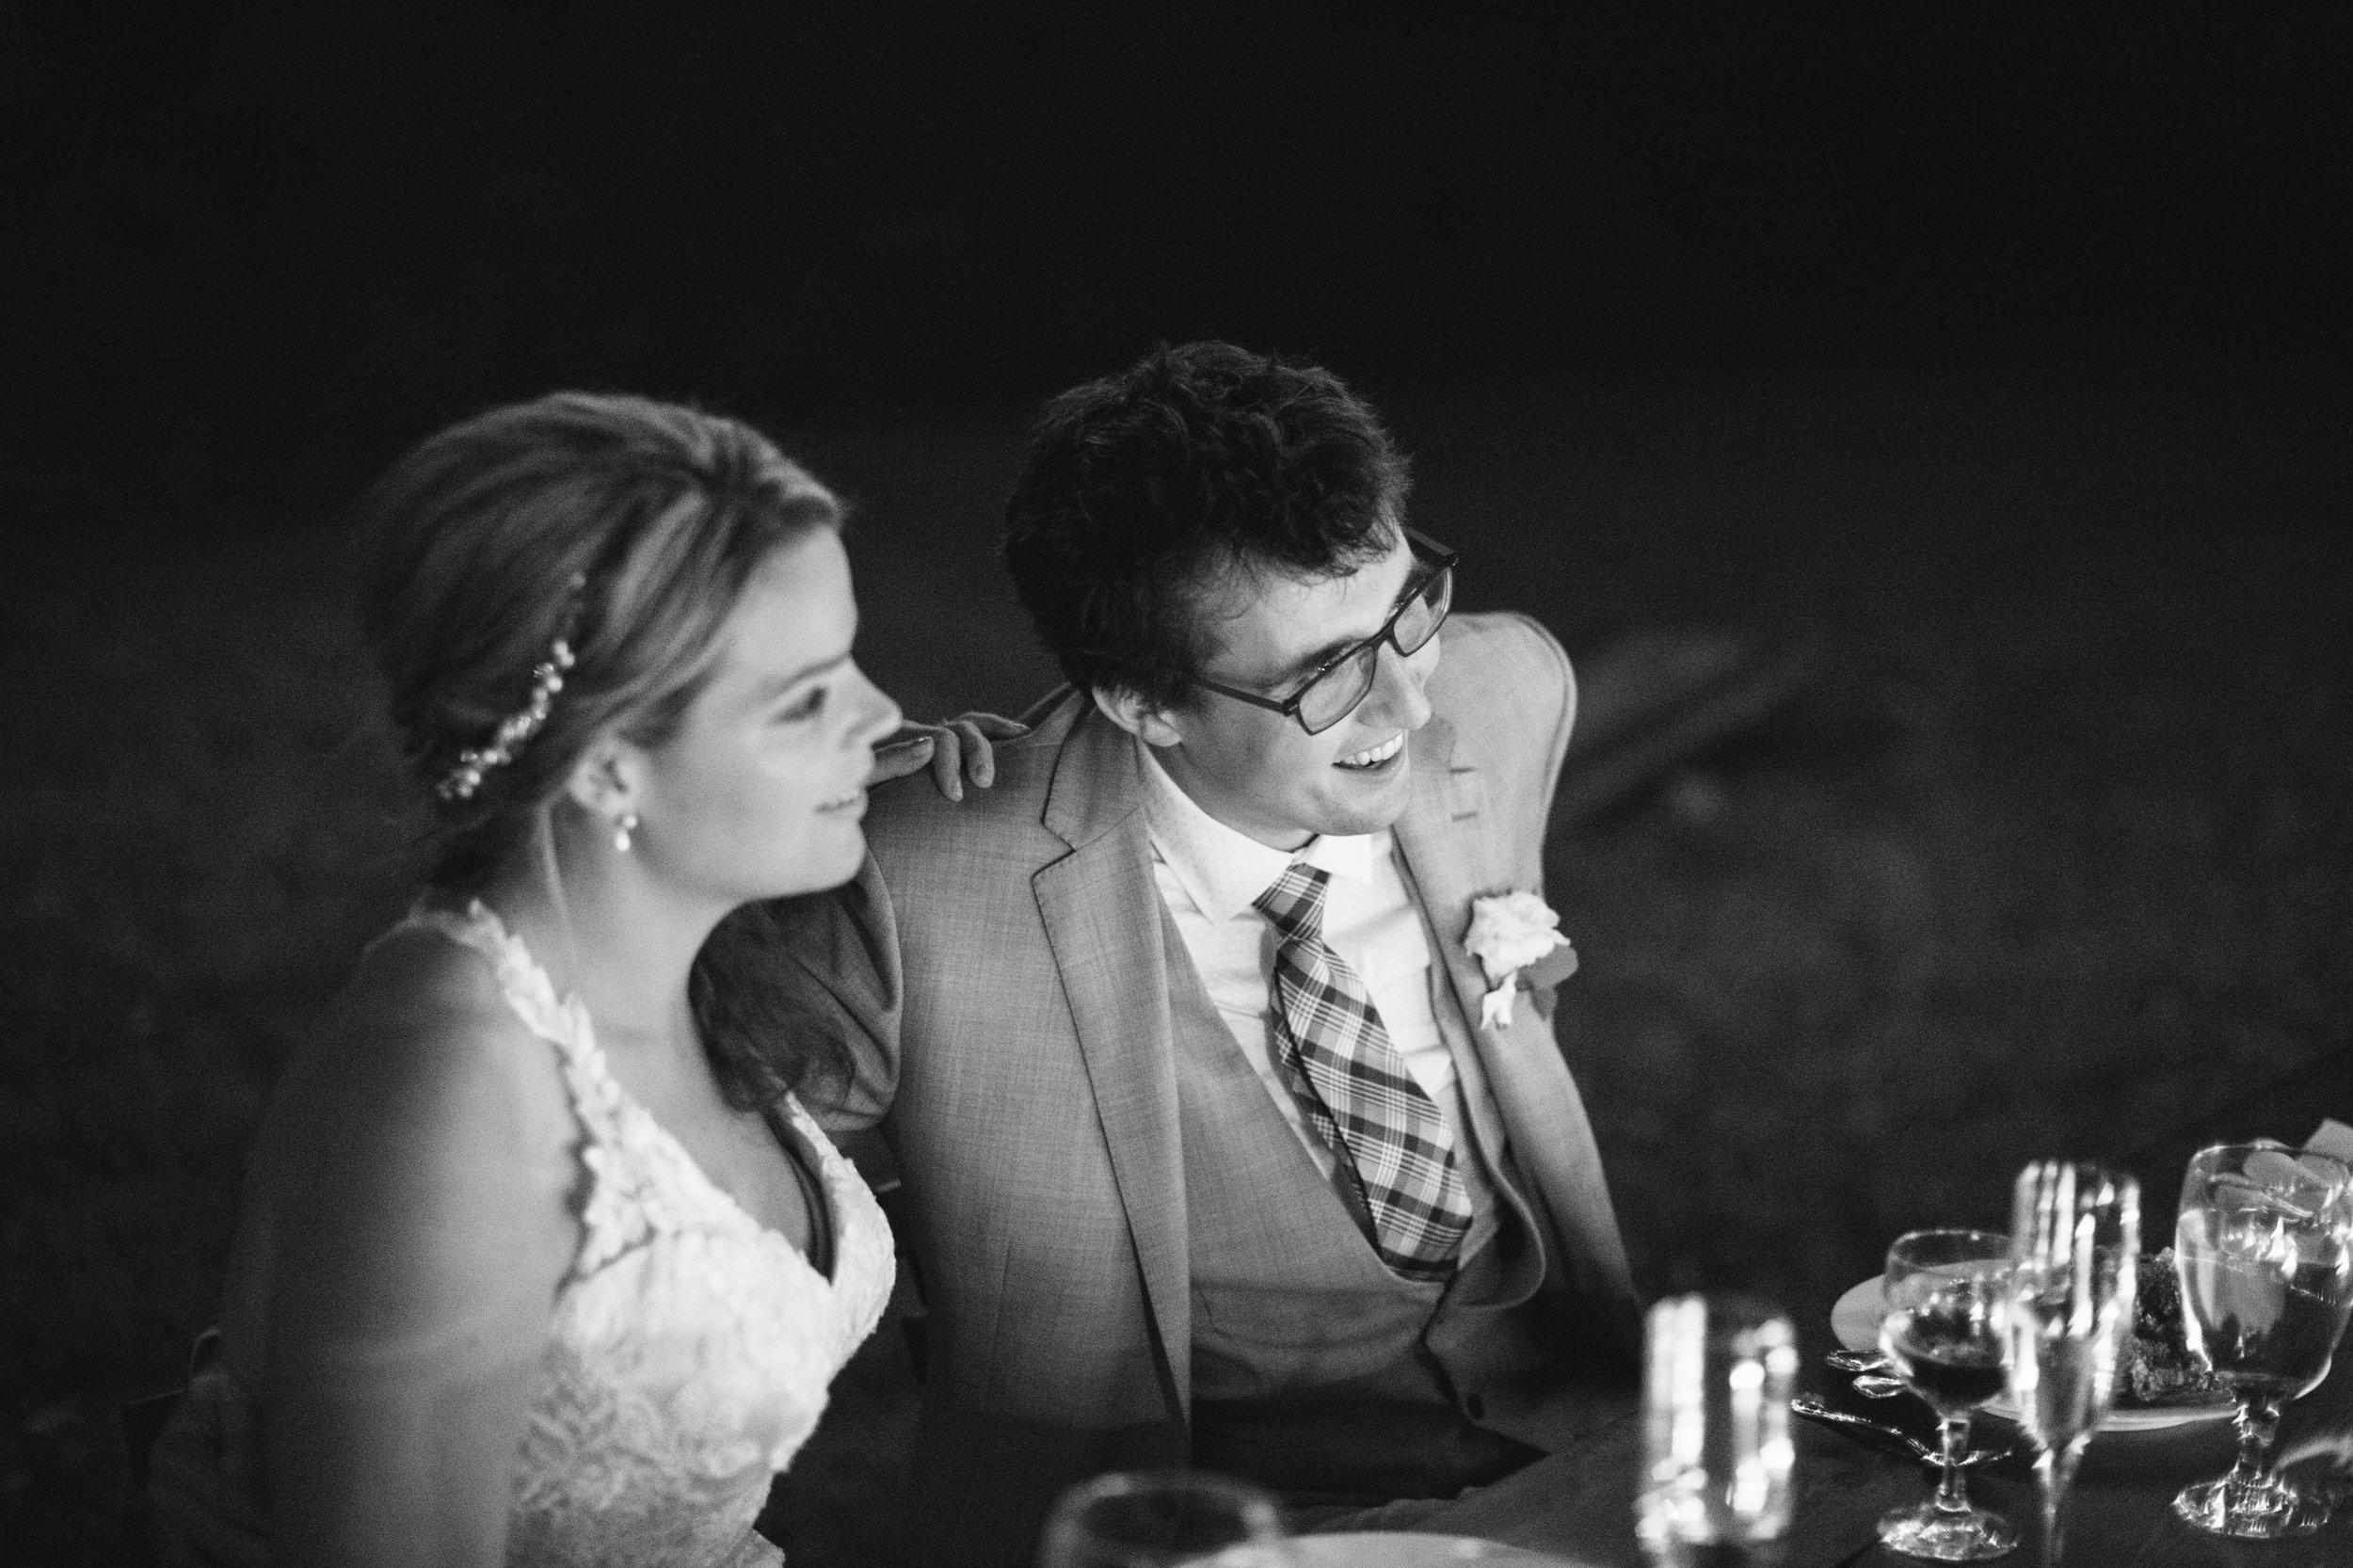 Abby_Simon_Wedding_Abigail_Malone_Photography_nashville_Bloomsbury_Farm-560.jpg